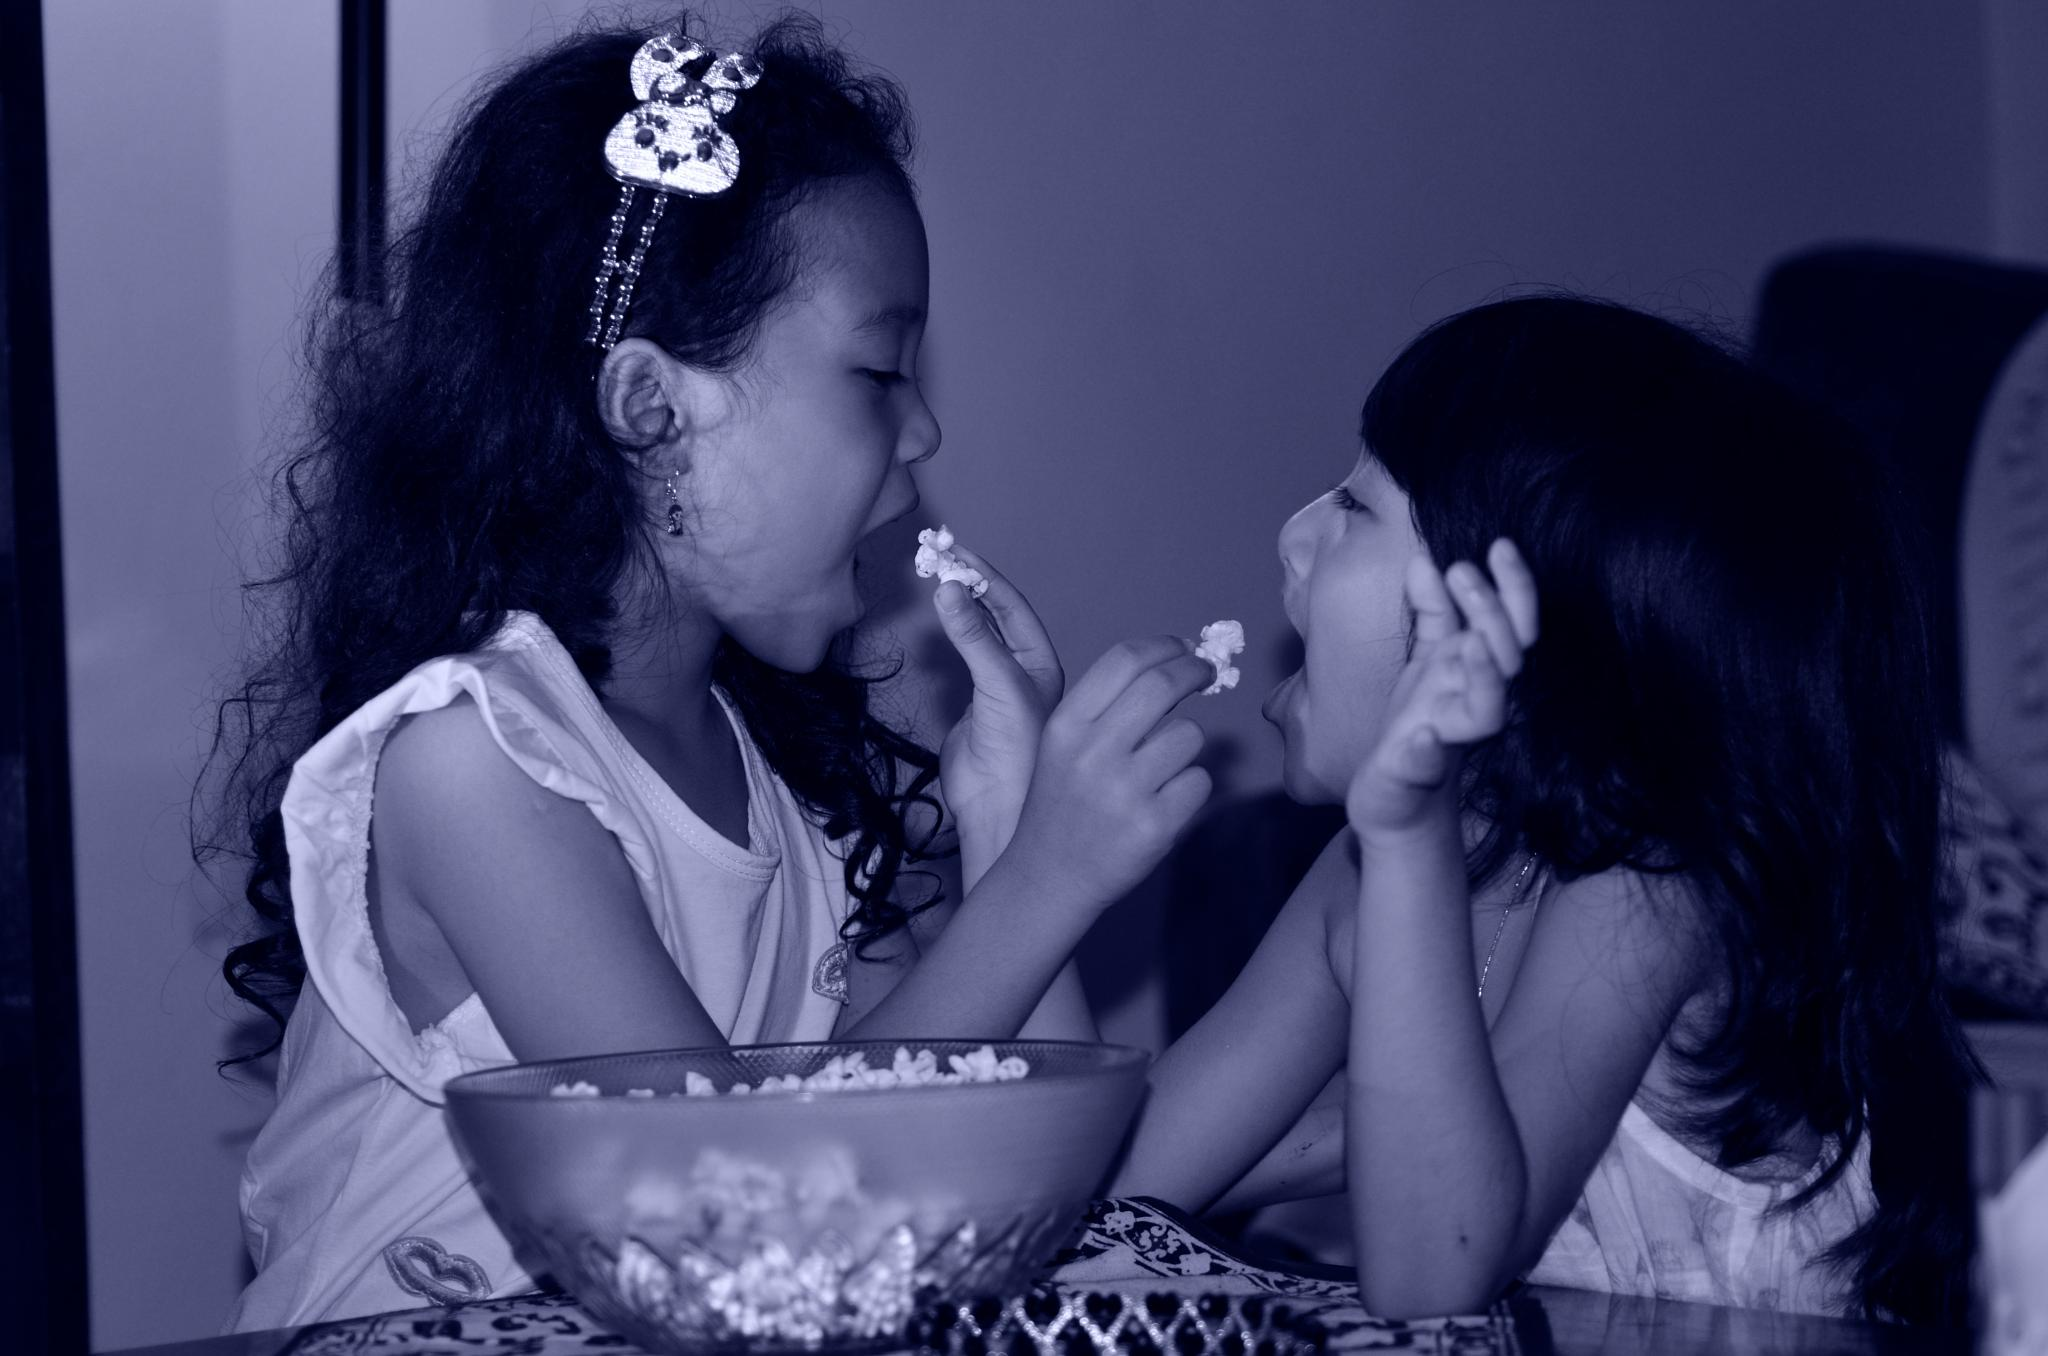 The Way We Enjoying Popcorn by Yulius